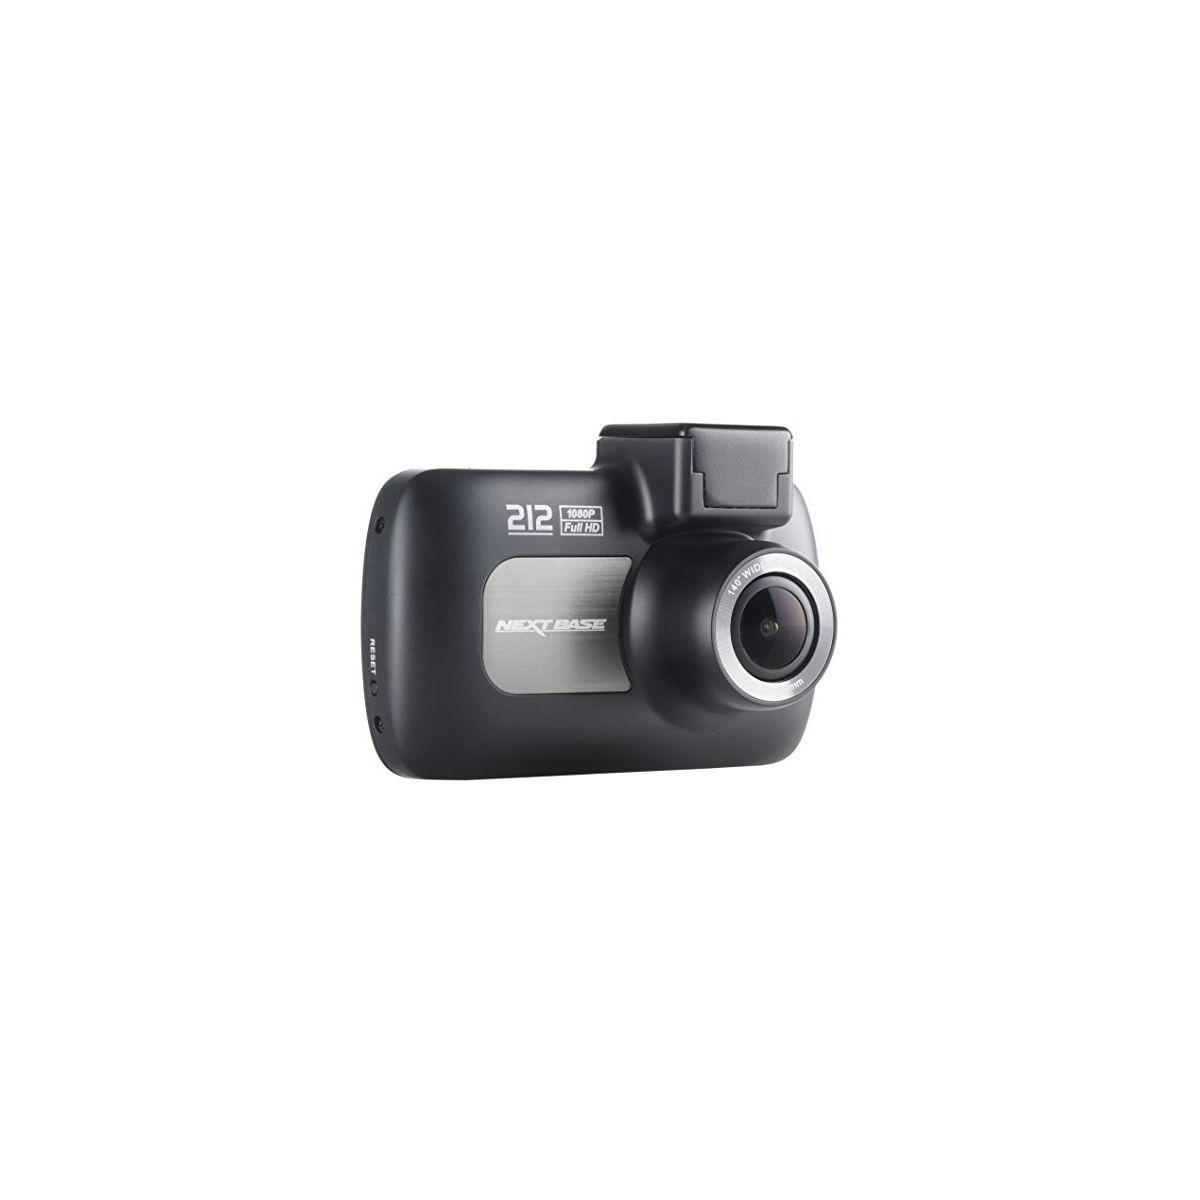 Caméra NEXT BASE 212 (photo)